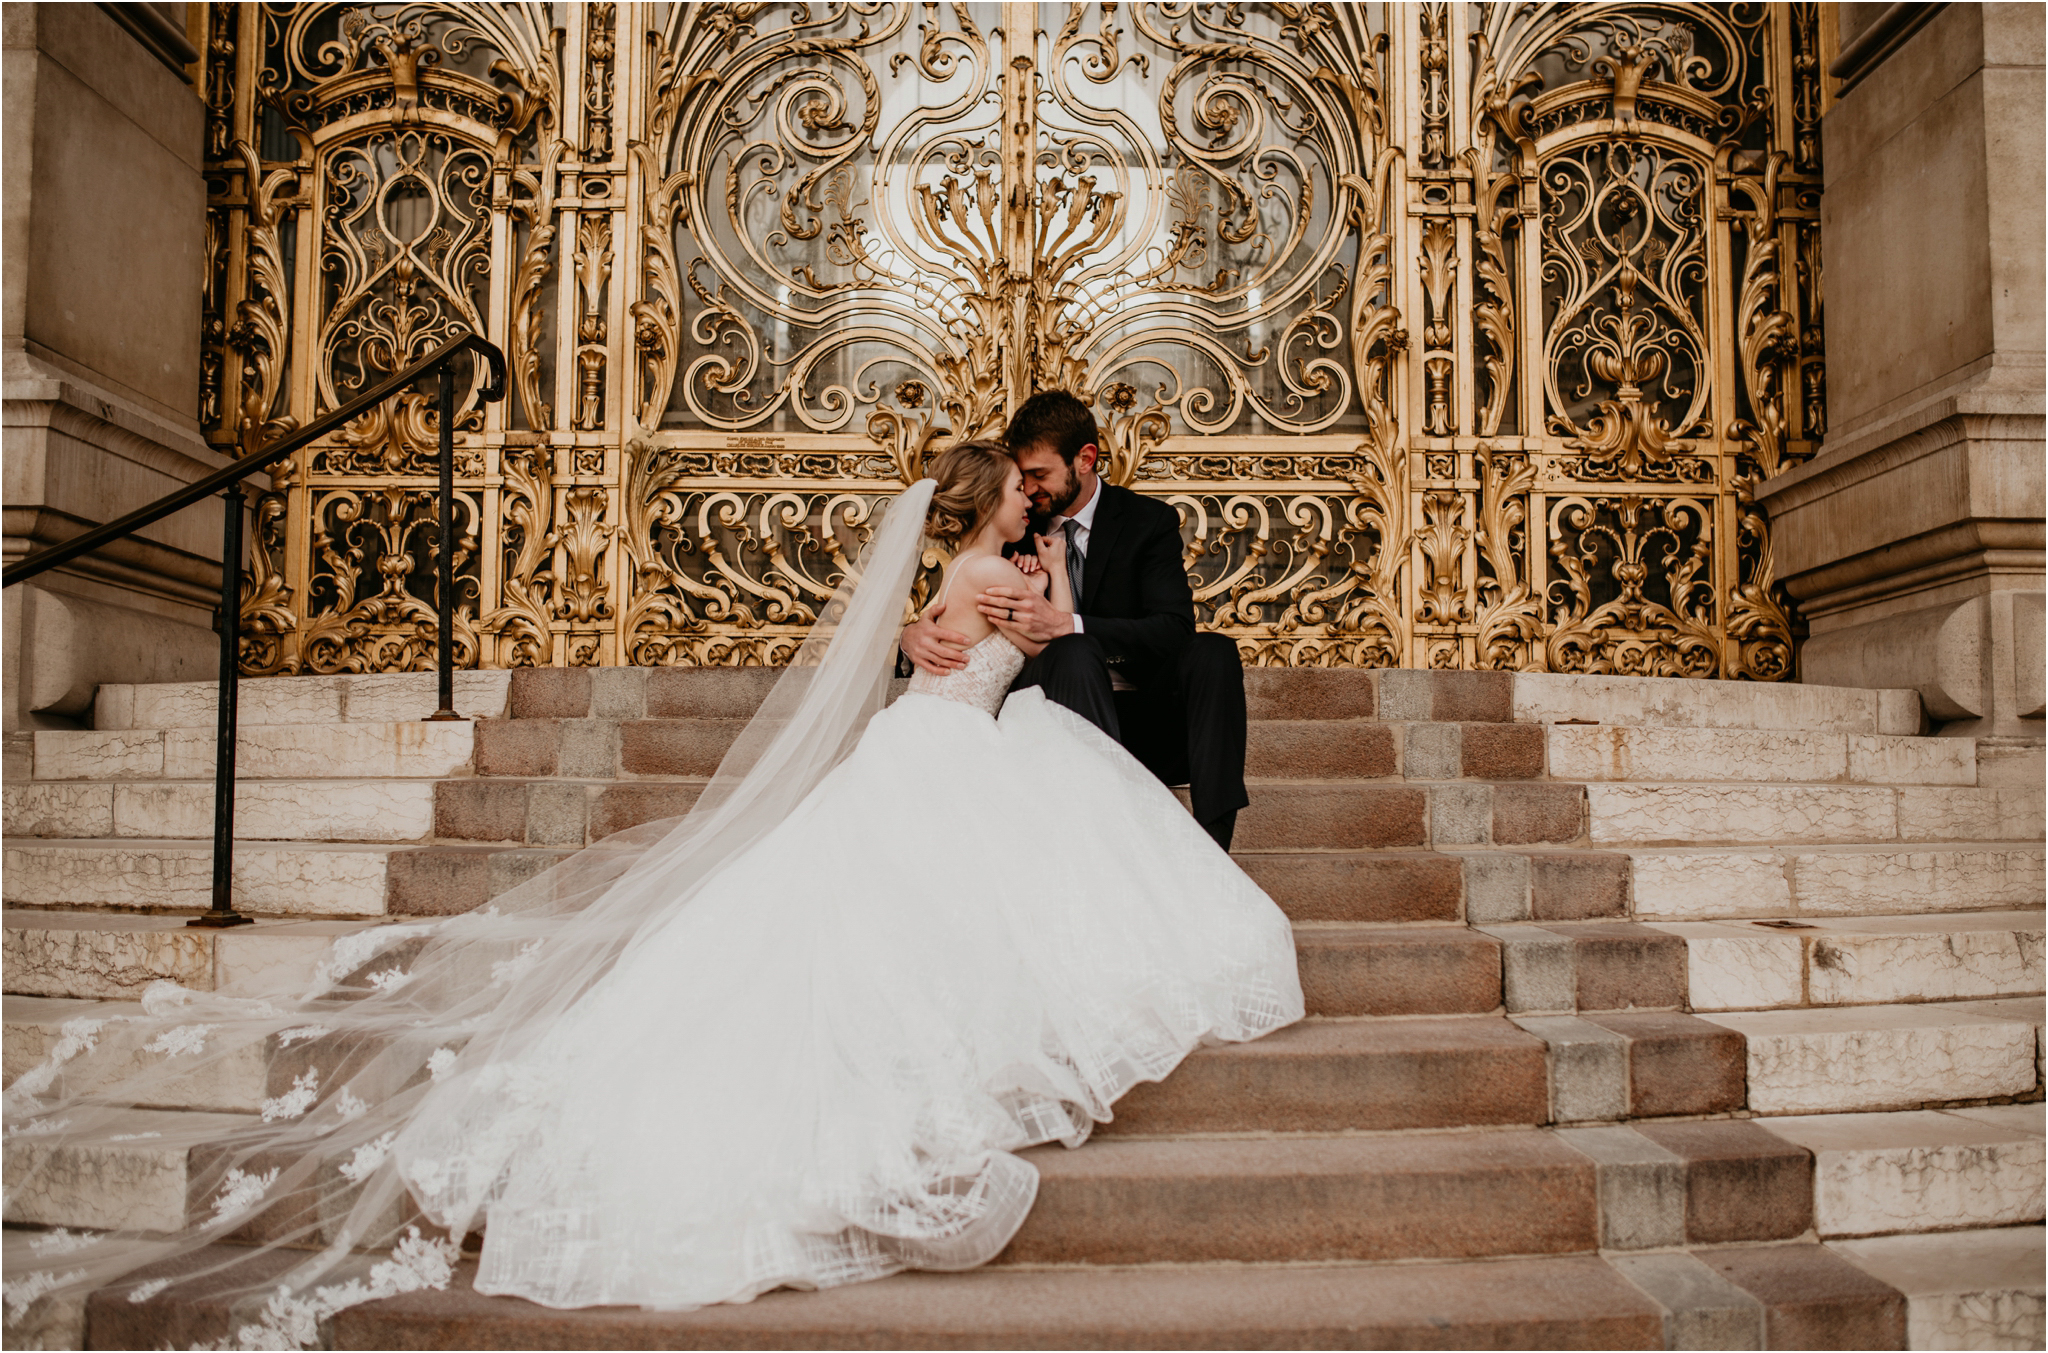 miranda-and-jared-paris-elopement-destination-wedding-photographer-078.jpg